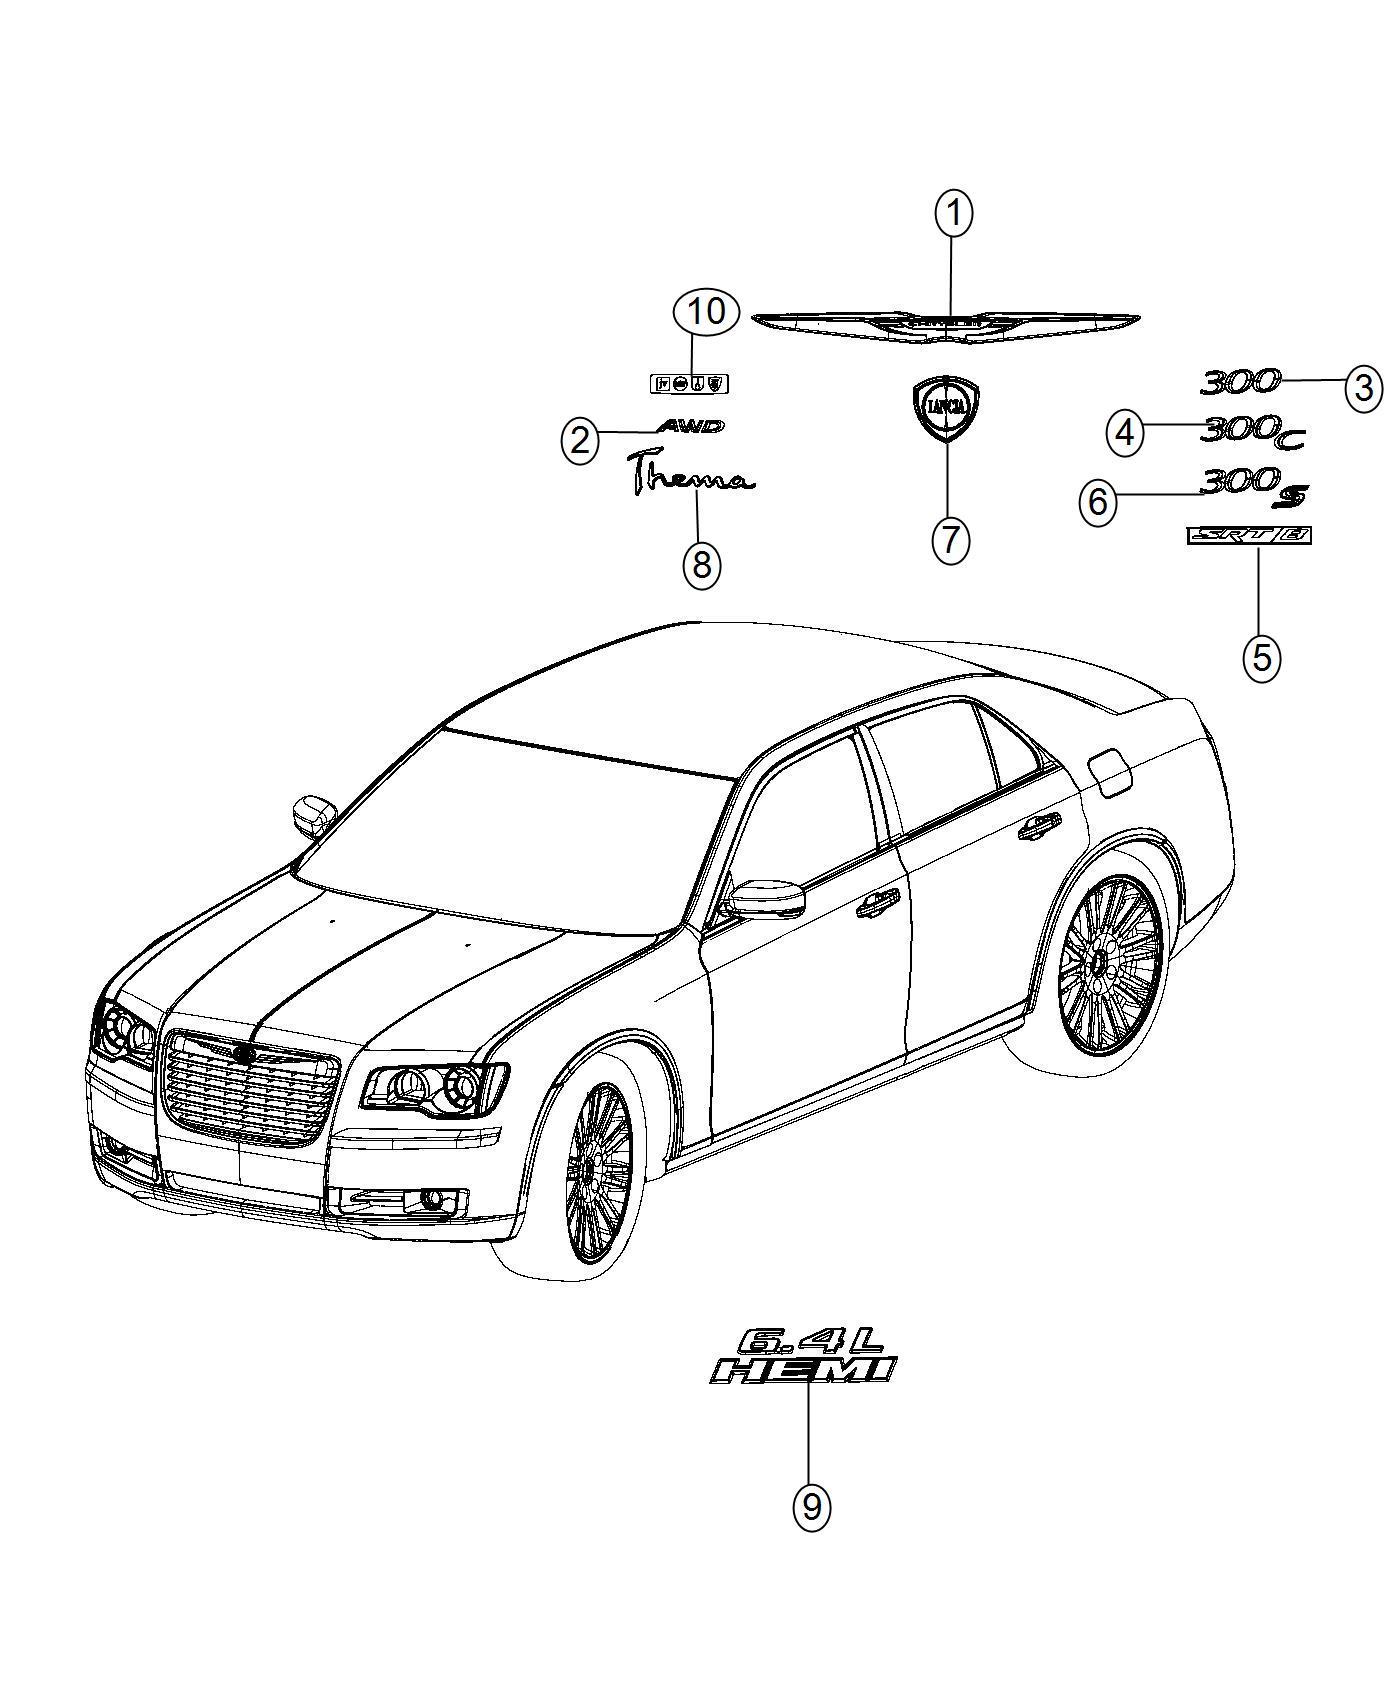 2014 Chrysler 300 Nameplate. Decklid. Awd. [all wheel